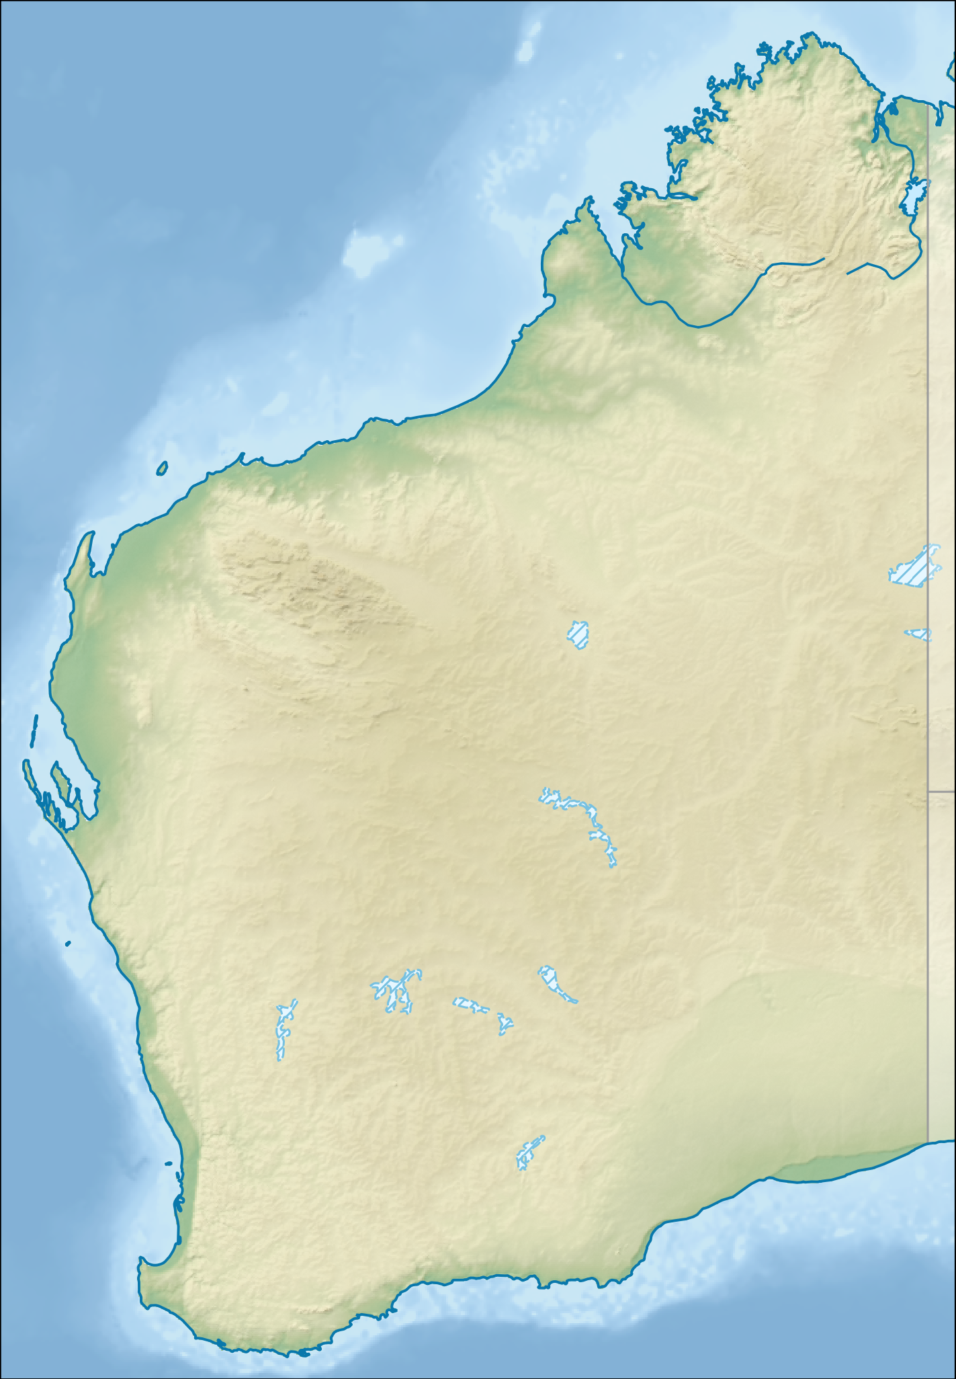 Australia_Western_Australia_relief_location_map